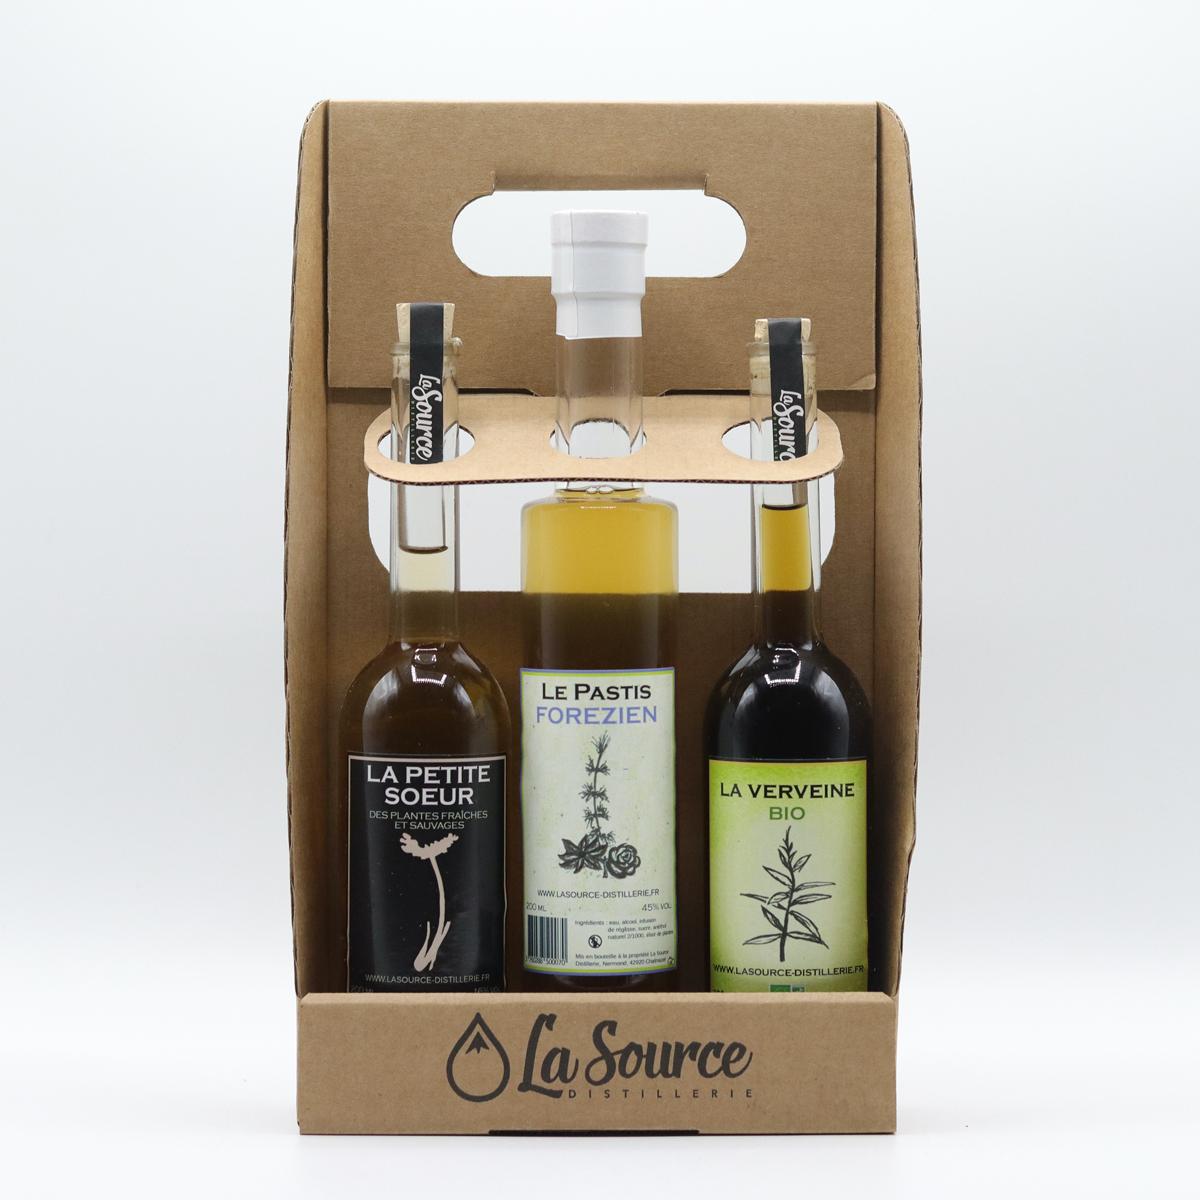 https://www.lasource-distillerie.fr/wp-content/uploads/2021/09/coffret-decouverte.jpg